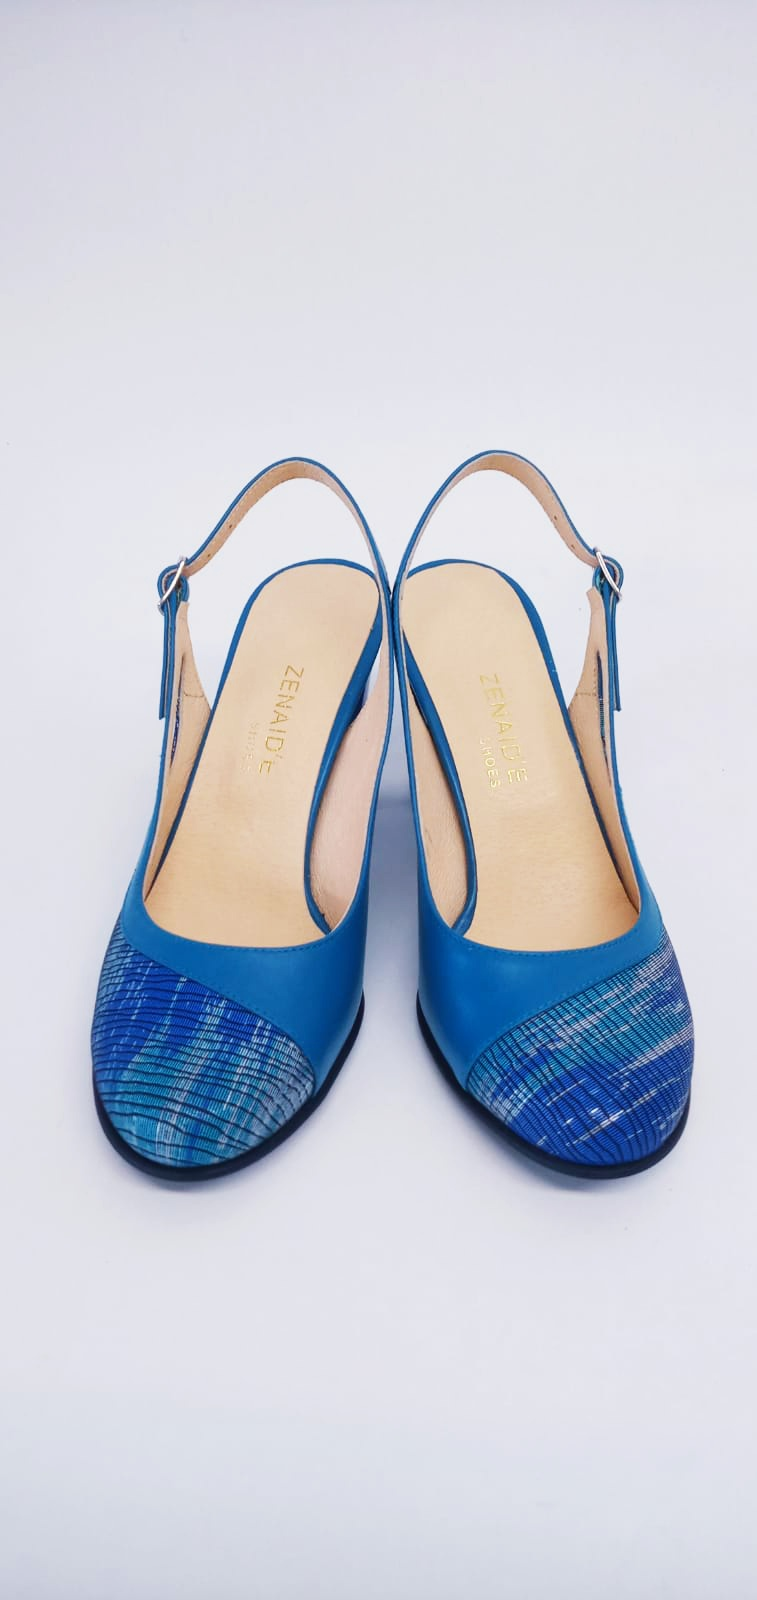 Sandale albastre din piele naturala